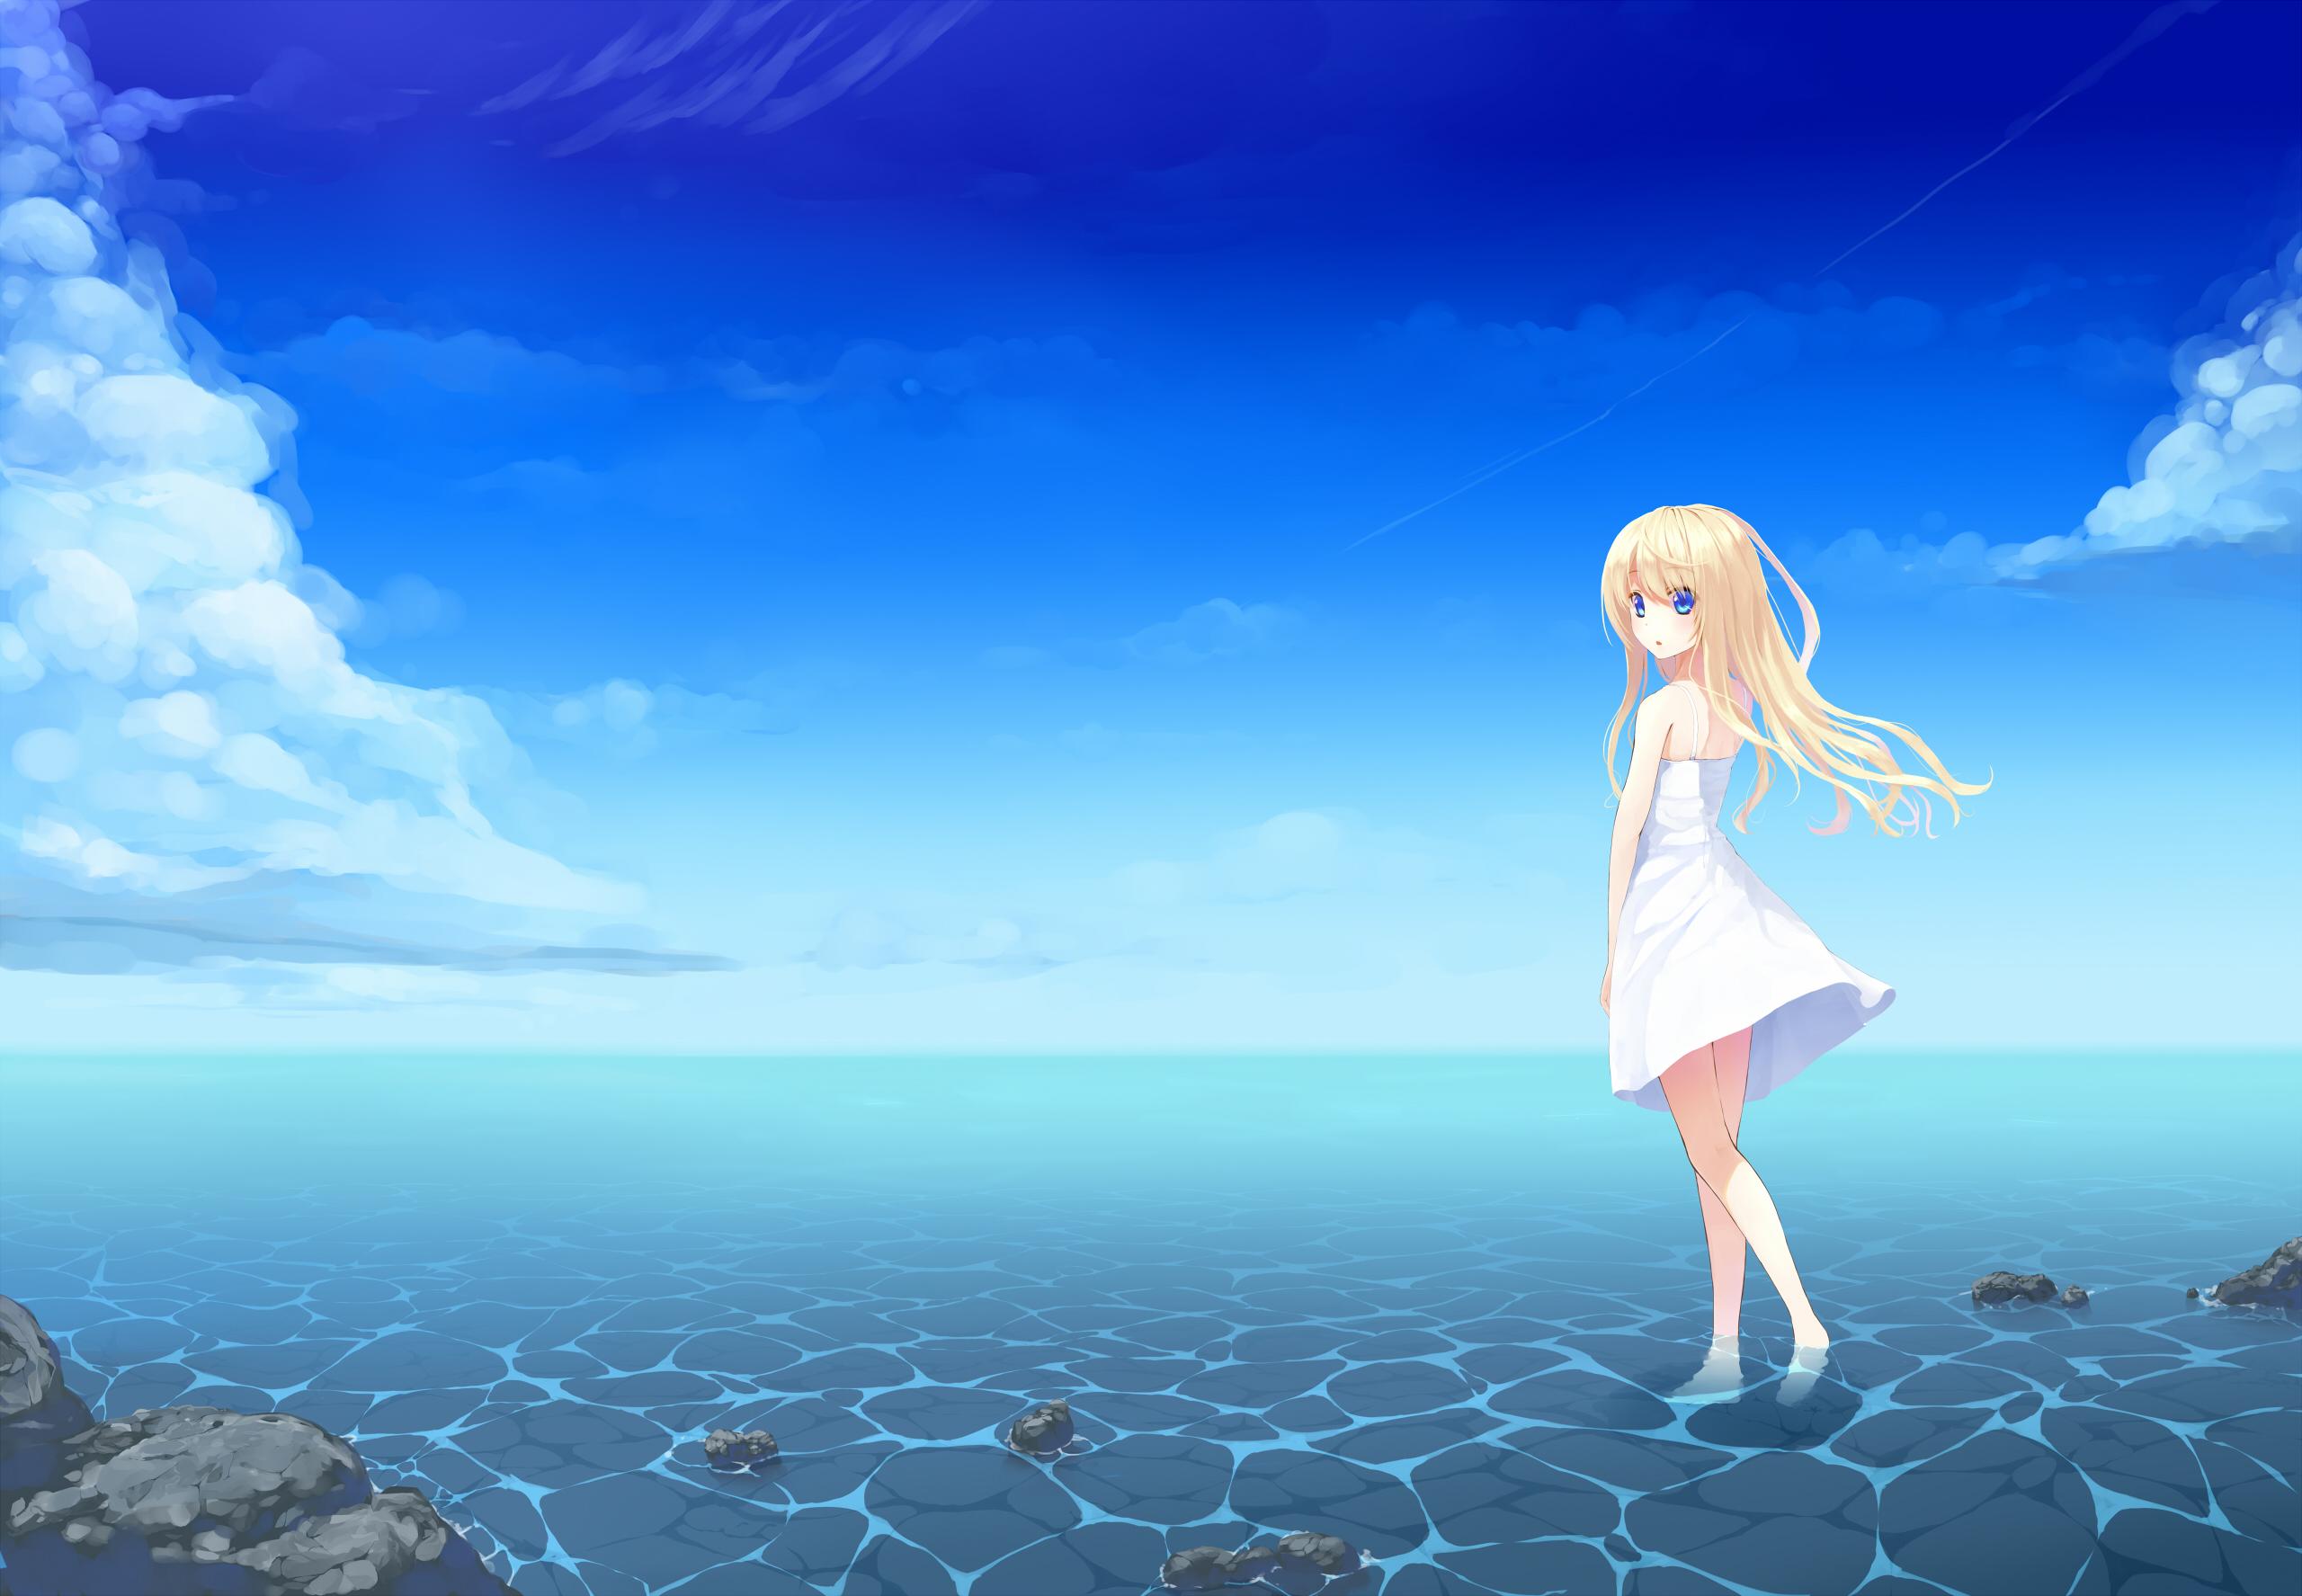 Wallpaper Girl, Anime, Sea, Beach, Dress HD, Picture, Image